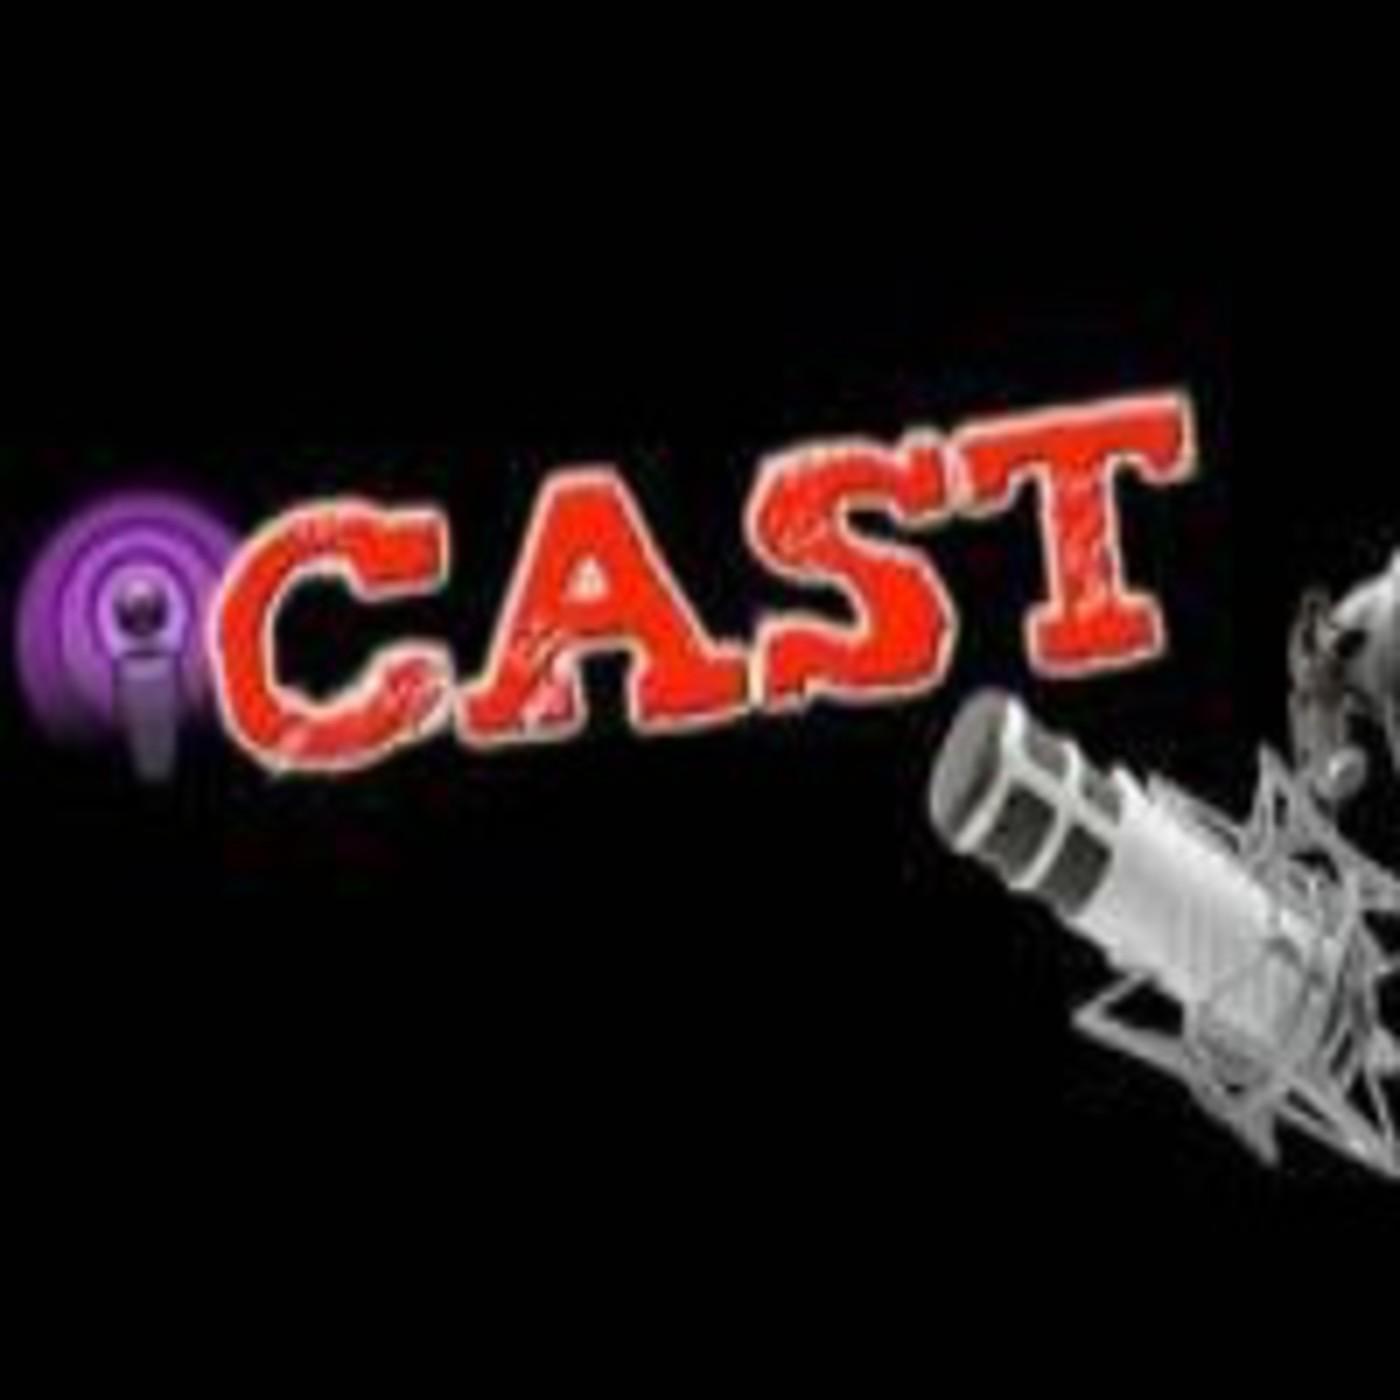 iCast Podcast - Episodio 2x00